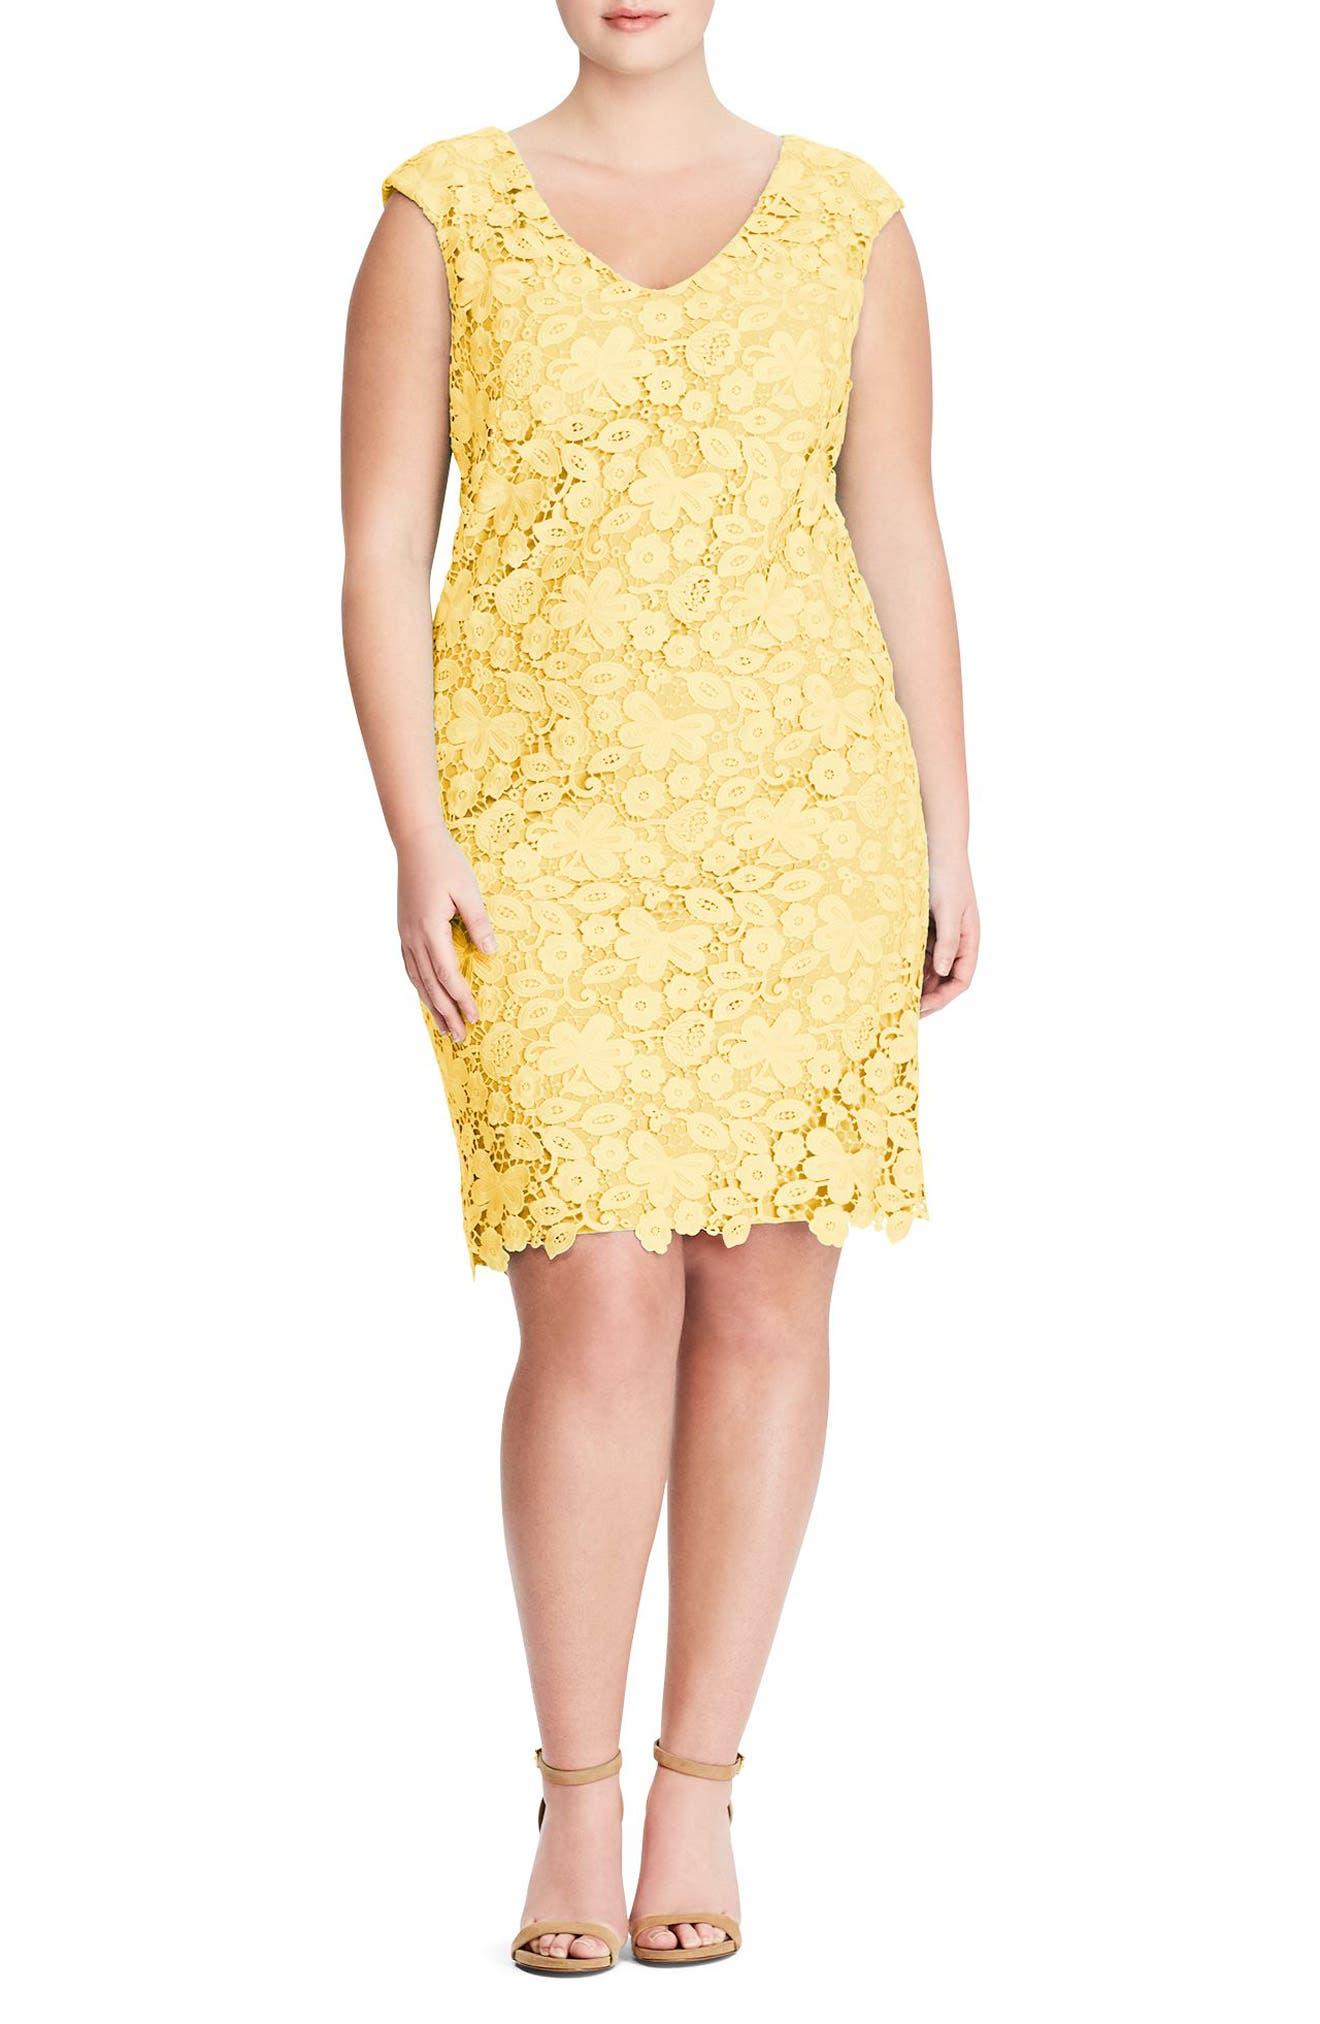 Montie Lace Sheath Dress,                         Main,                         color, Island Yellow